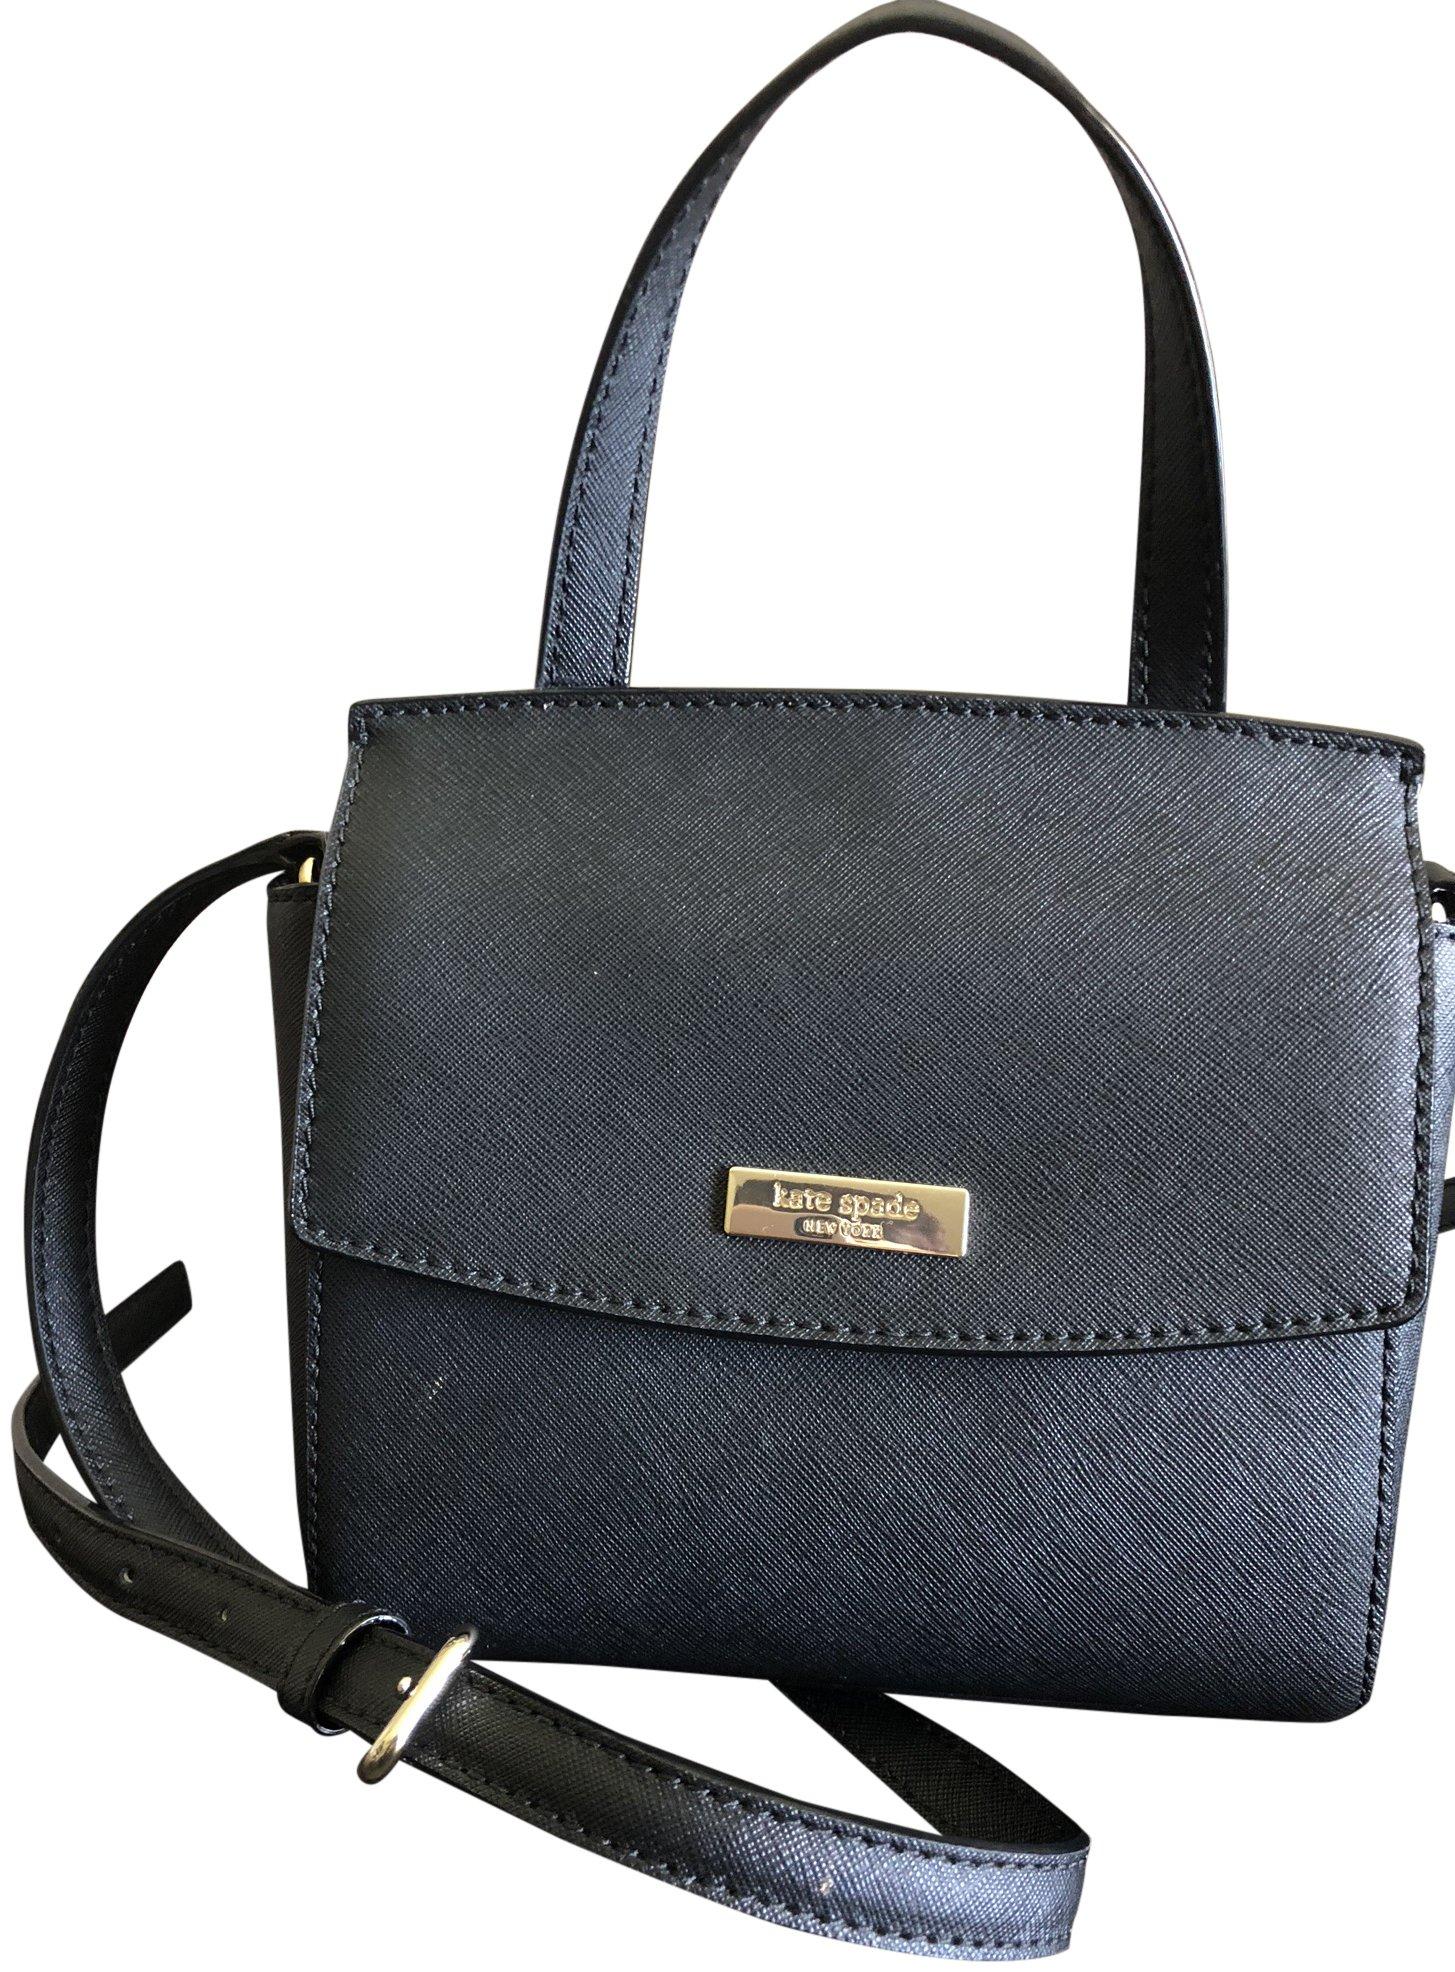 Kate Spade Mini Alisanne Laurel Way Top Handle Crossbody Black